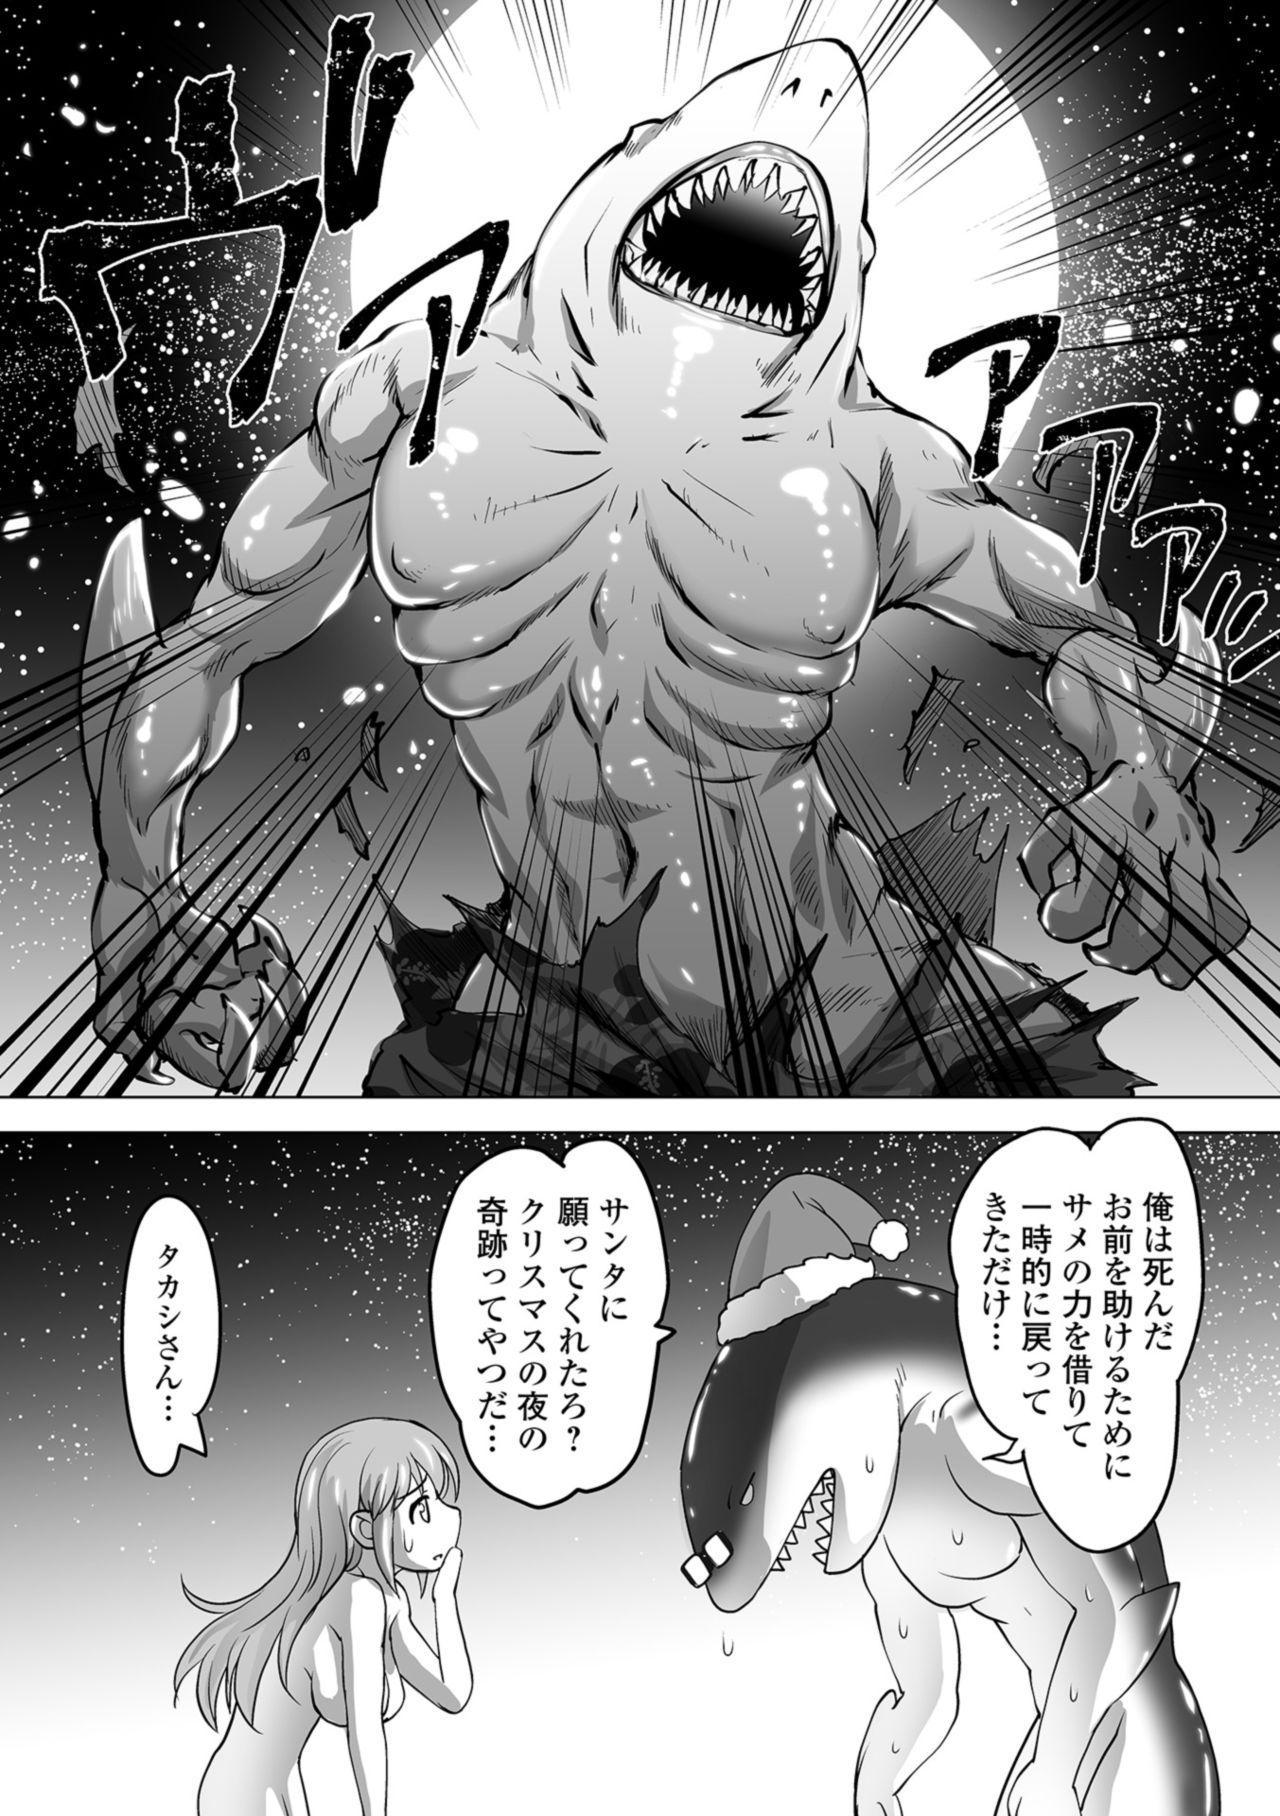 COMIC Shigekiteki SQUIRT!! Vol. 09 131